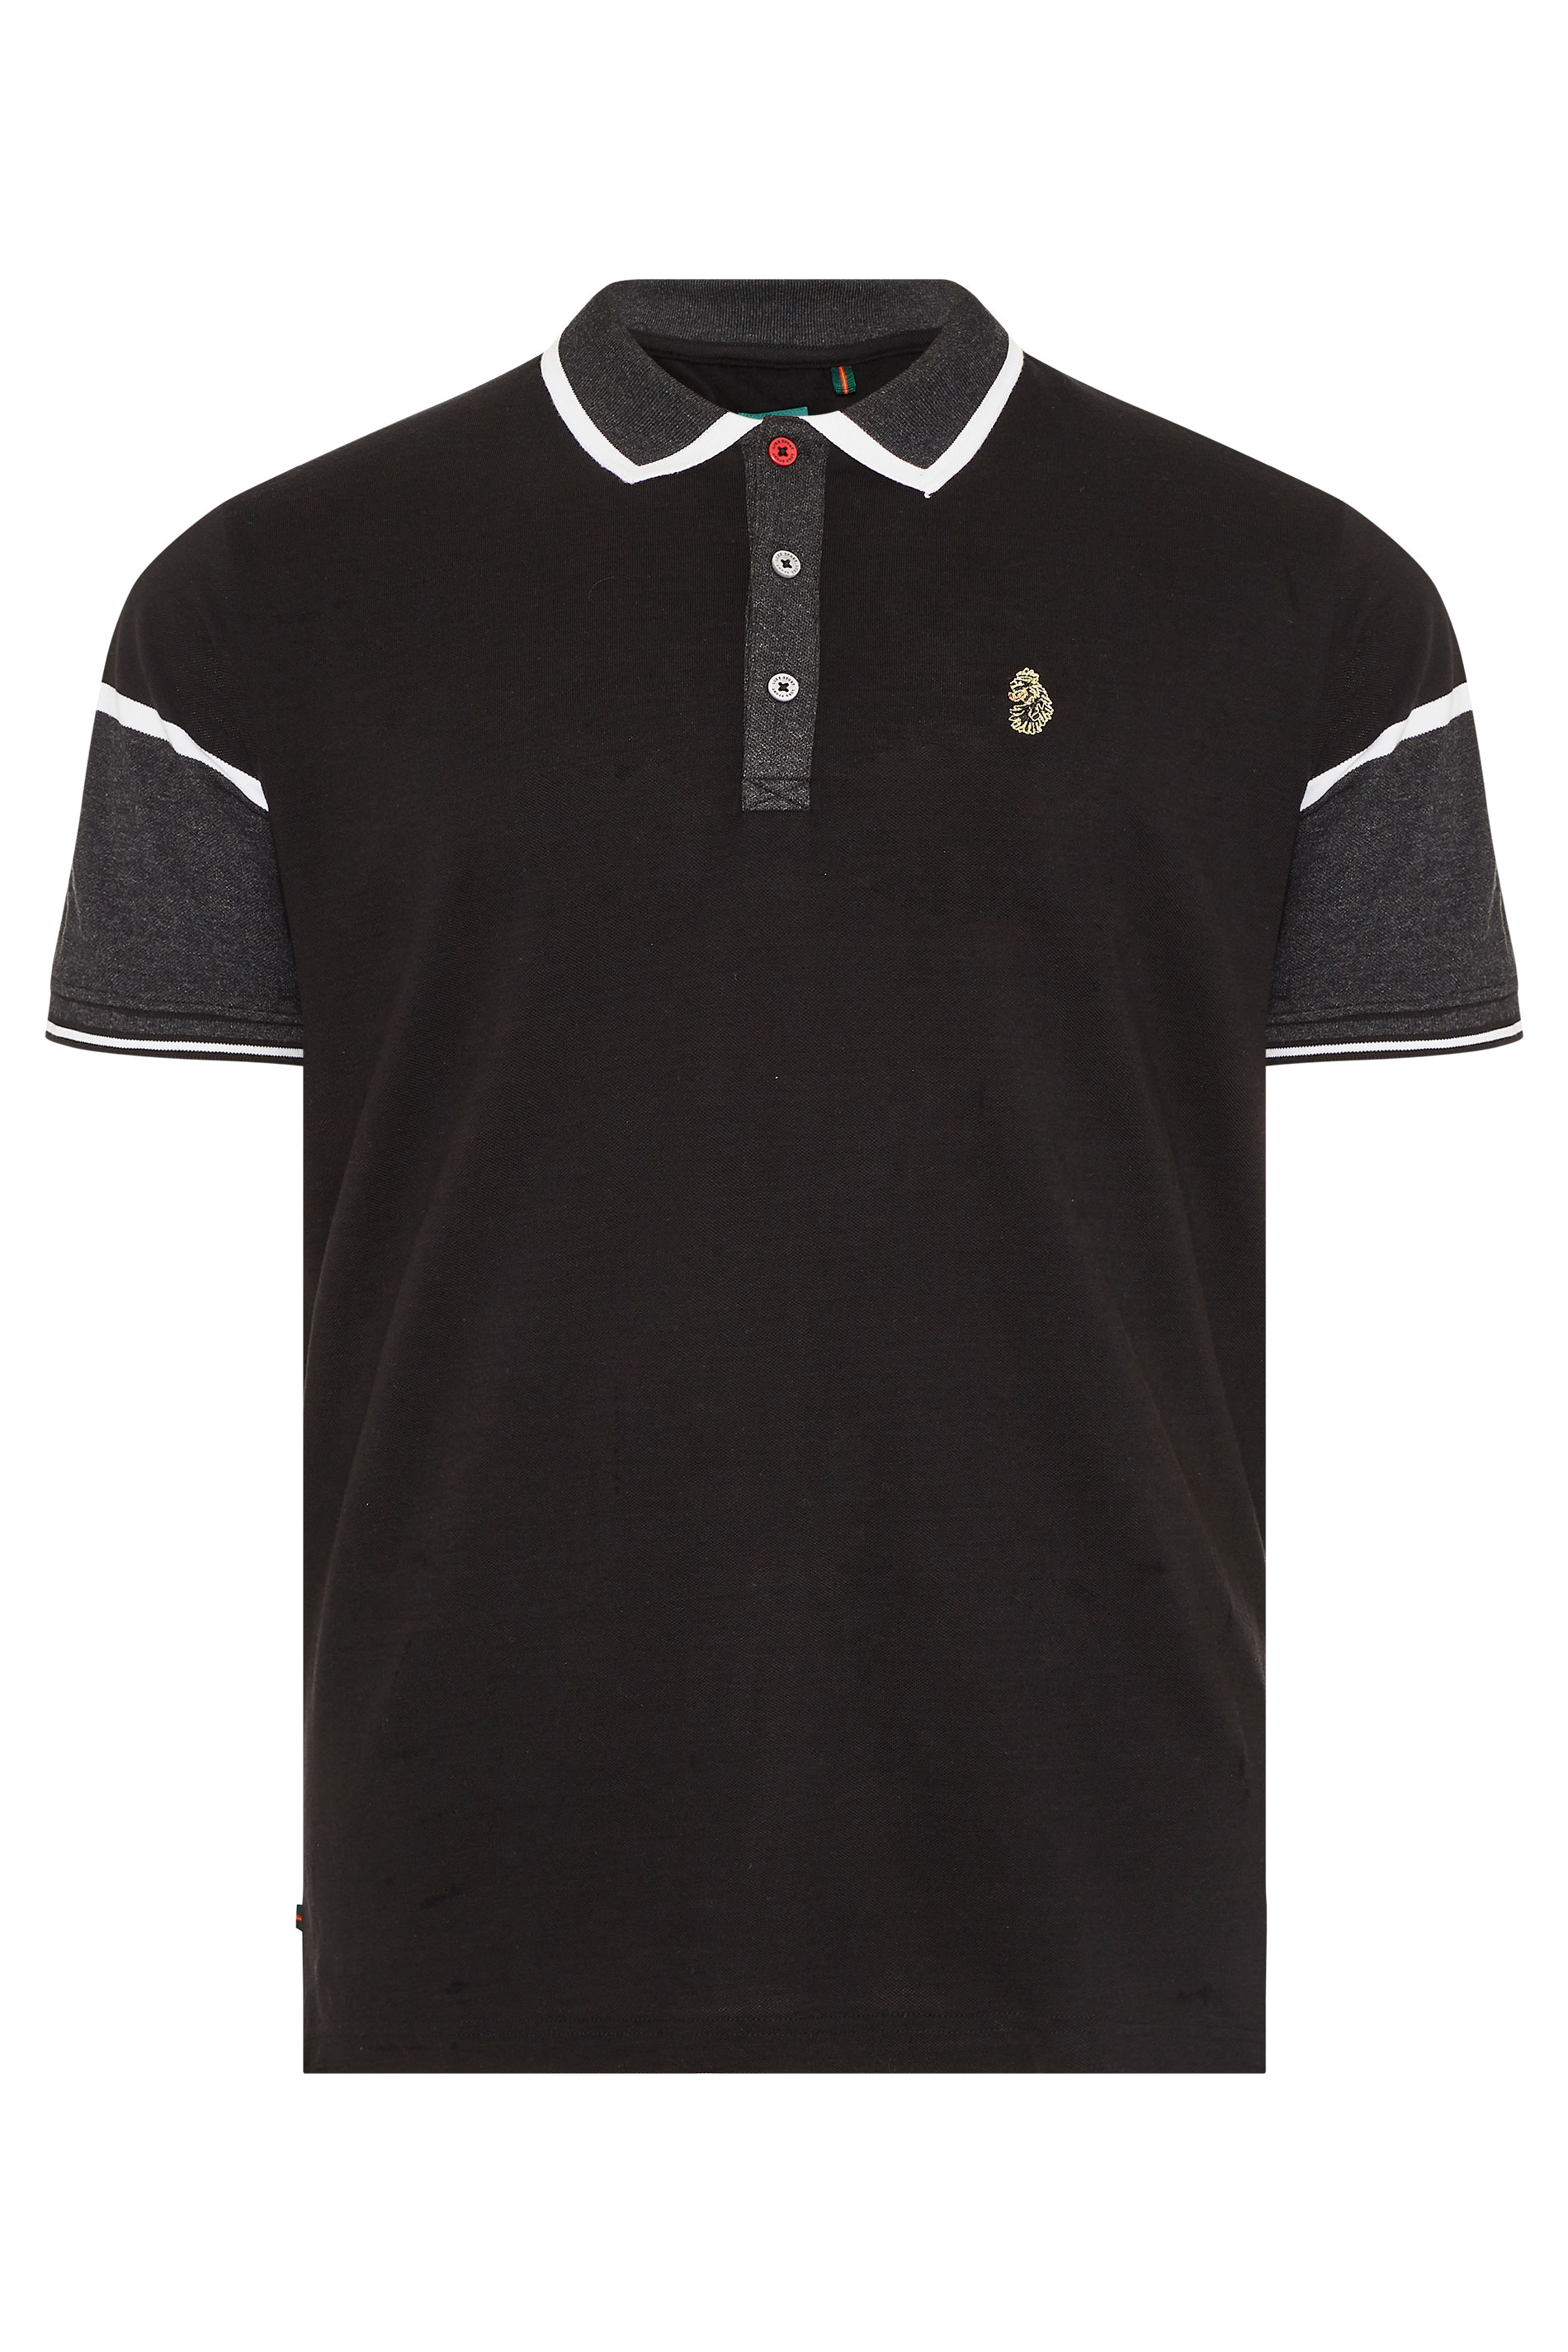 LUKE 1977 Black Boyo Polo Shirt